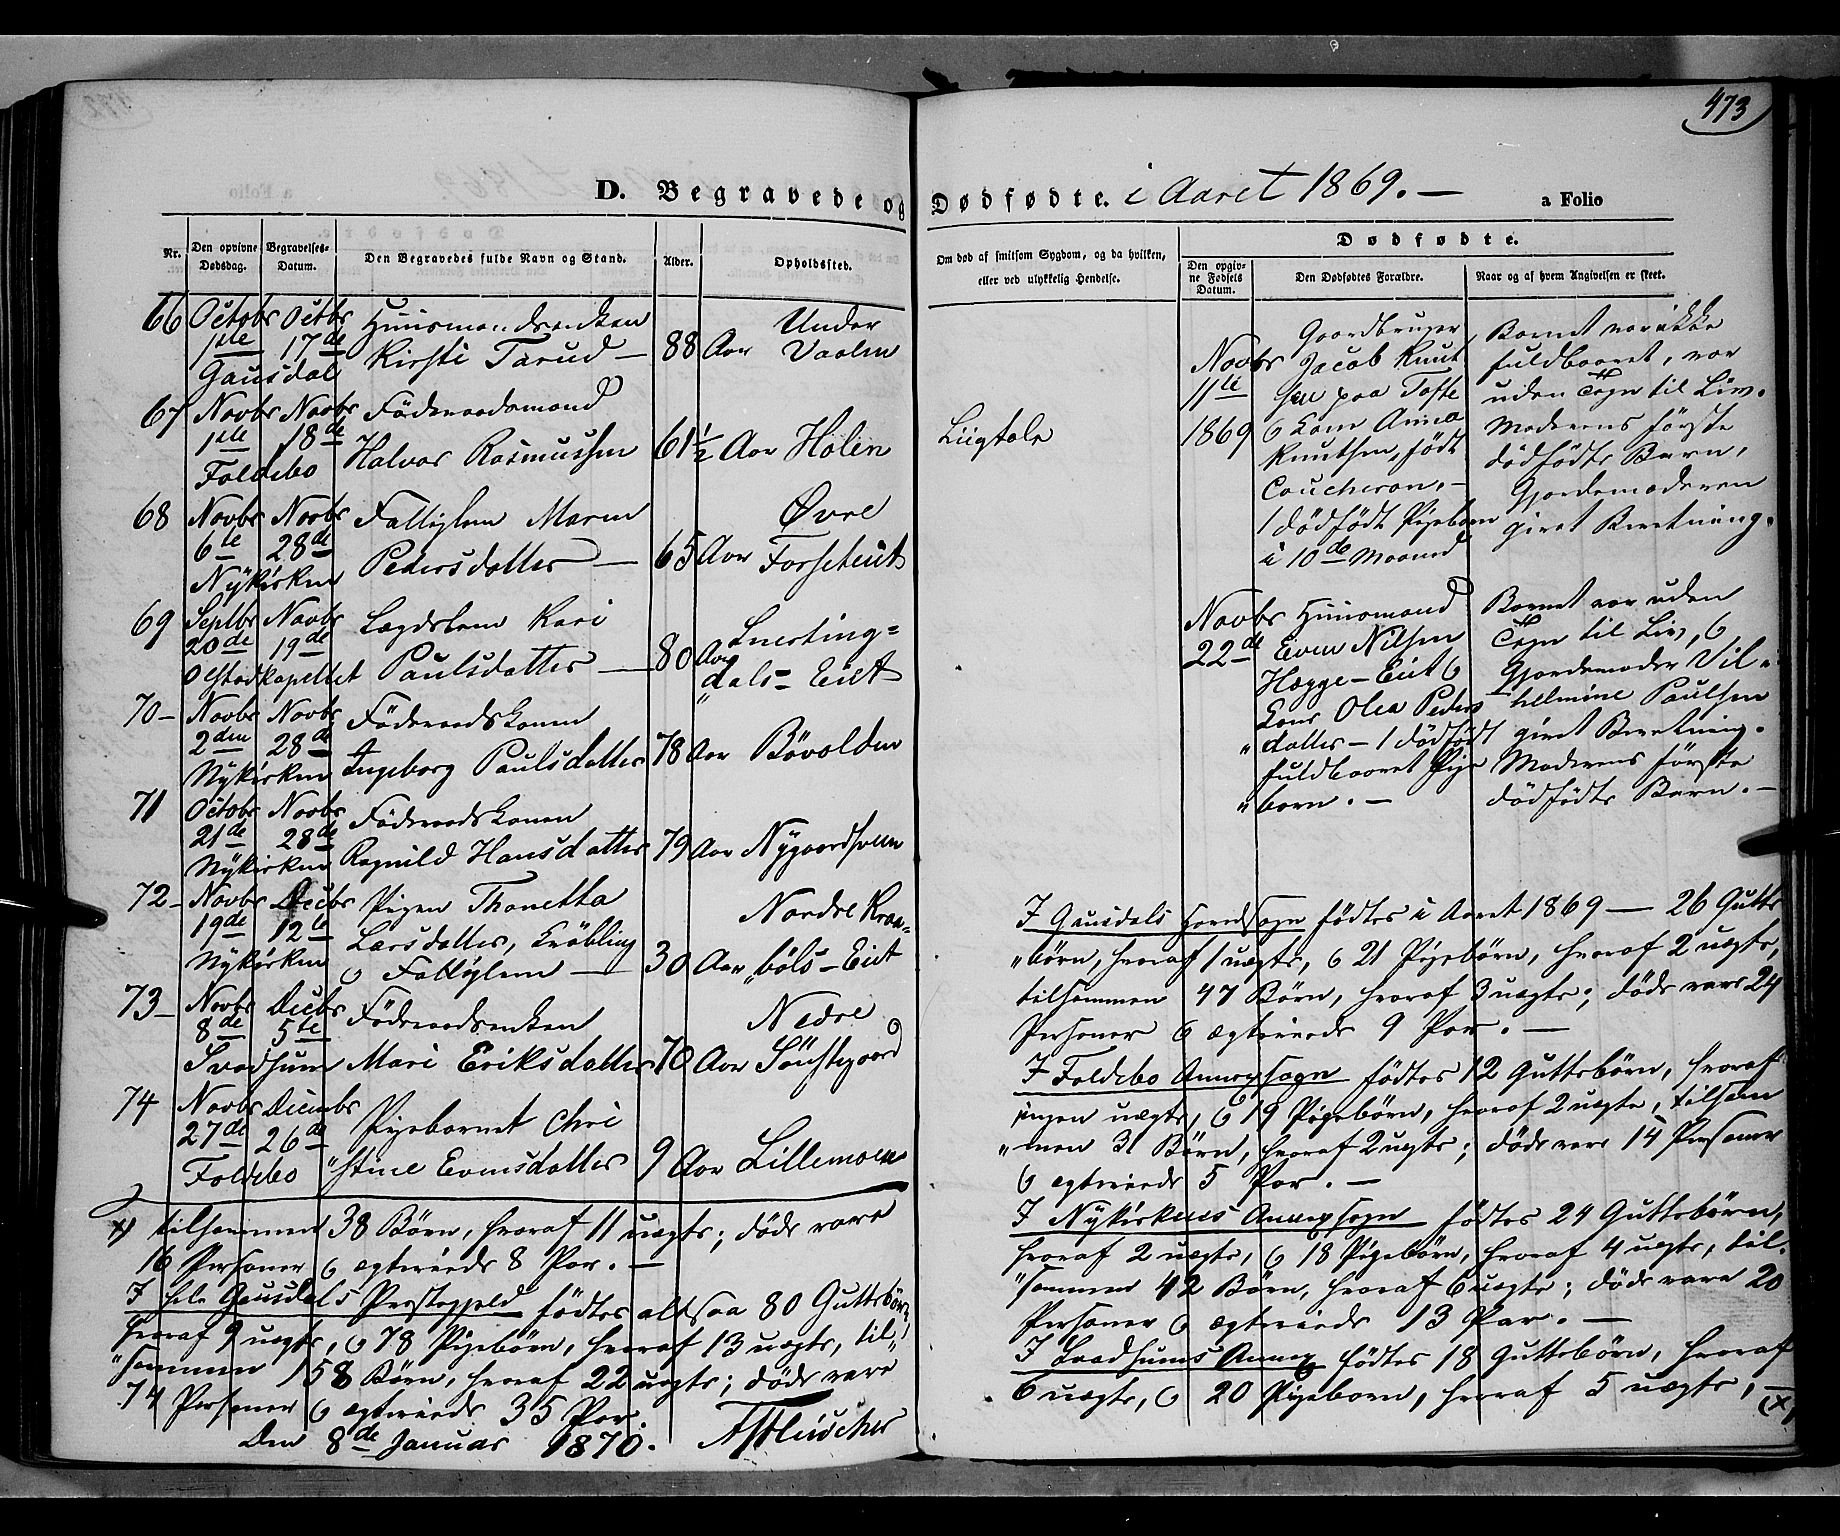 SAH, Gausdal prestekontor, Ministerialbok nr. 9, 1862-1873, s. 473